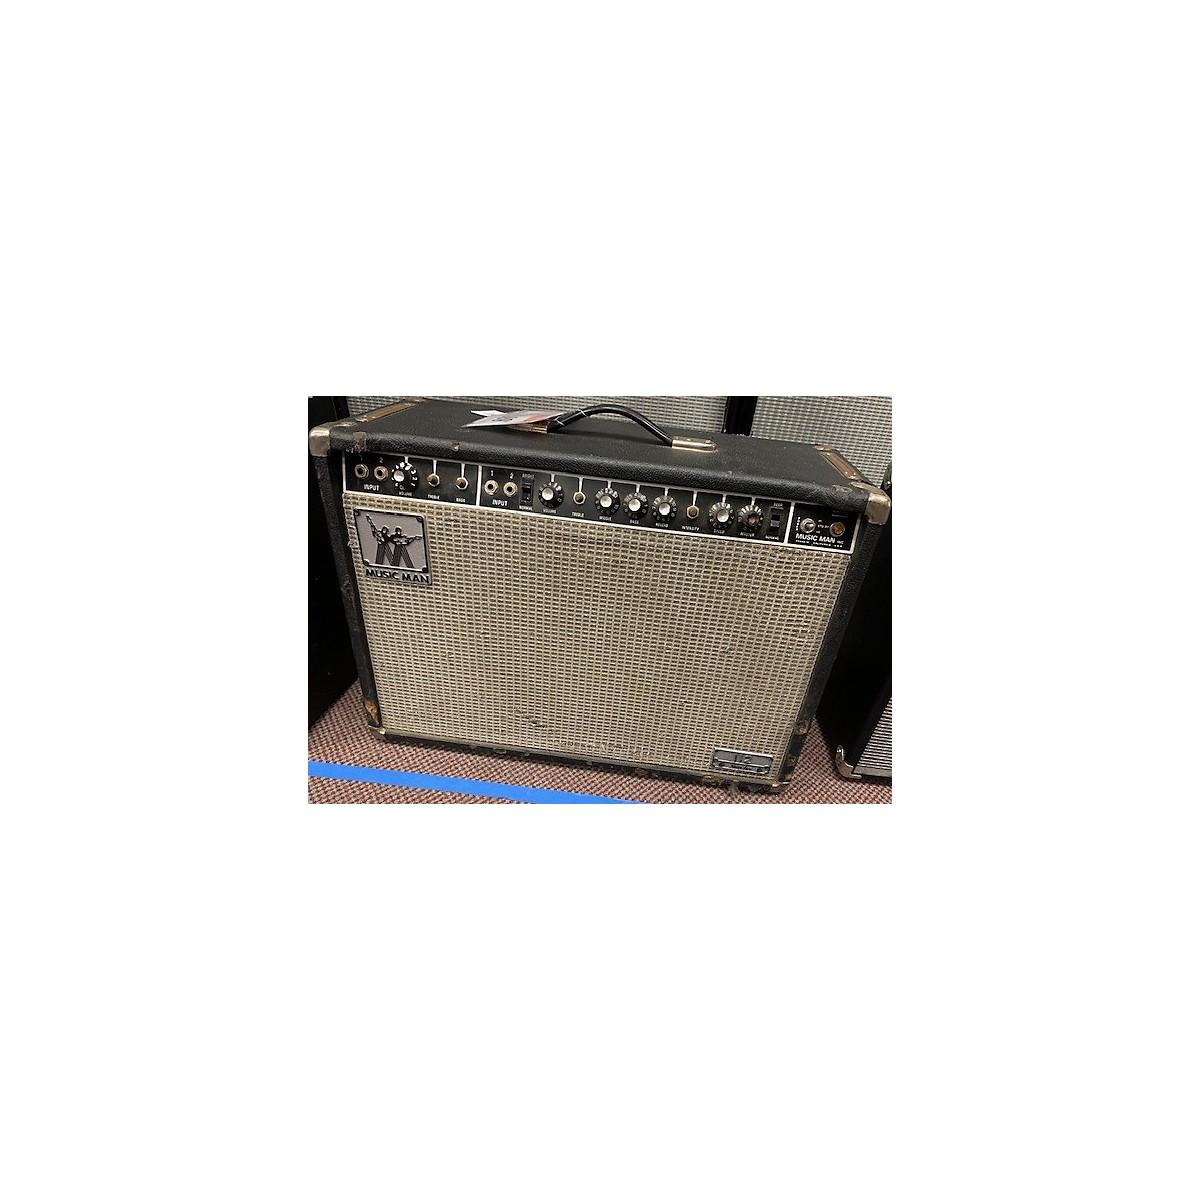 Ernie Ball Music Man 1979 112 Tube Guitar Combo Amp